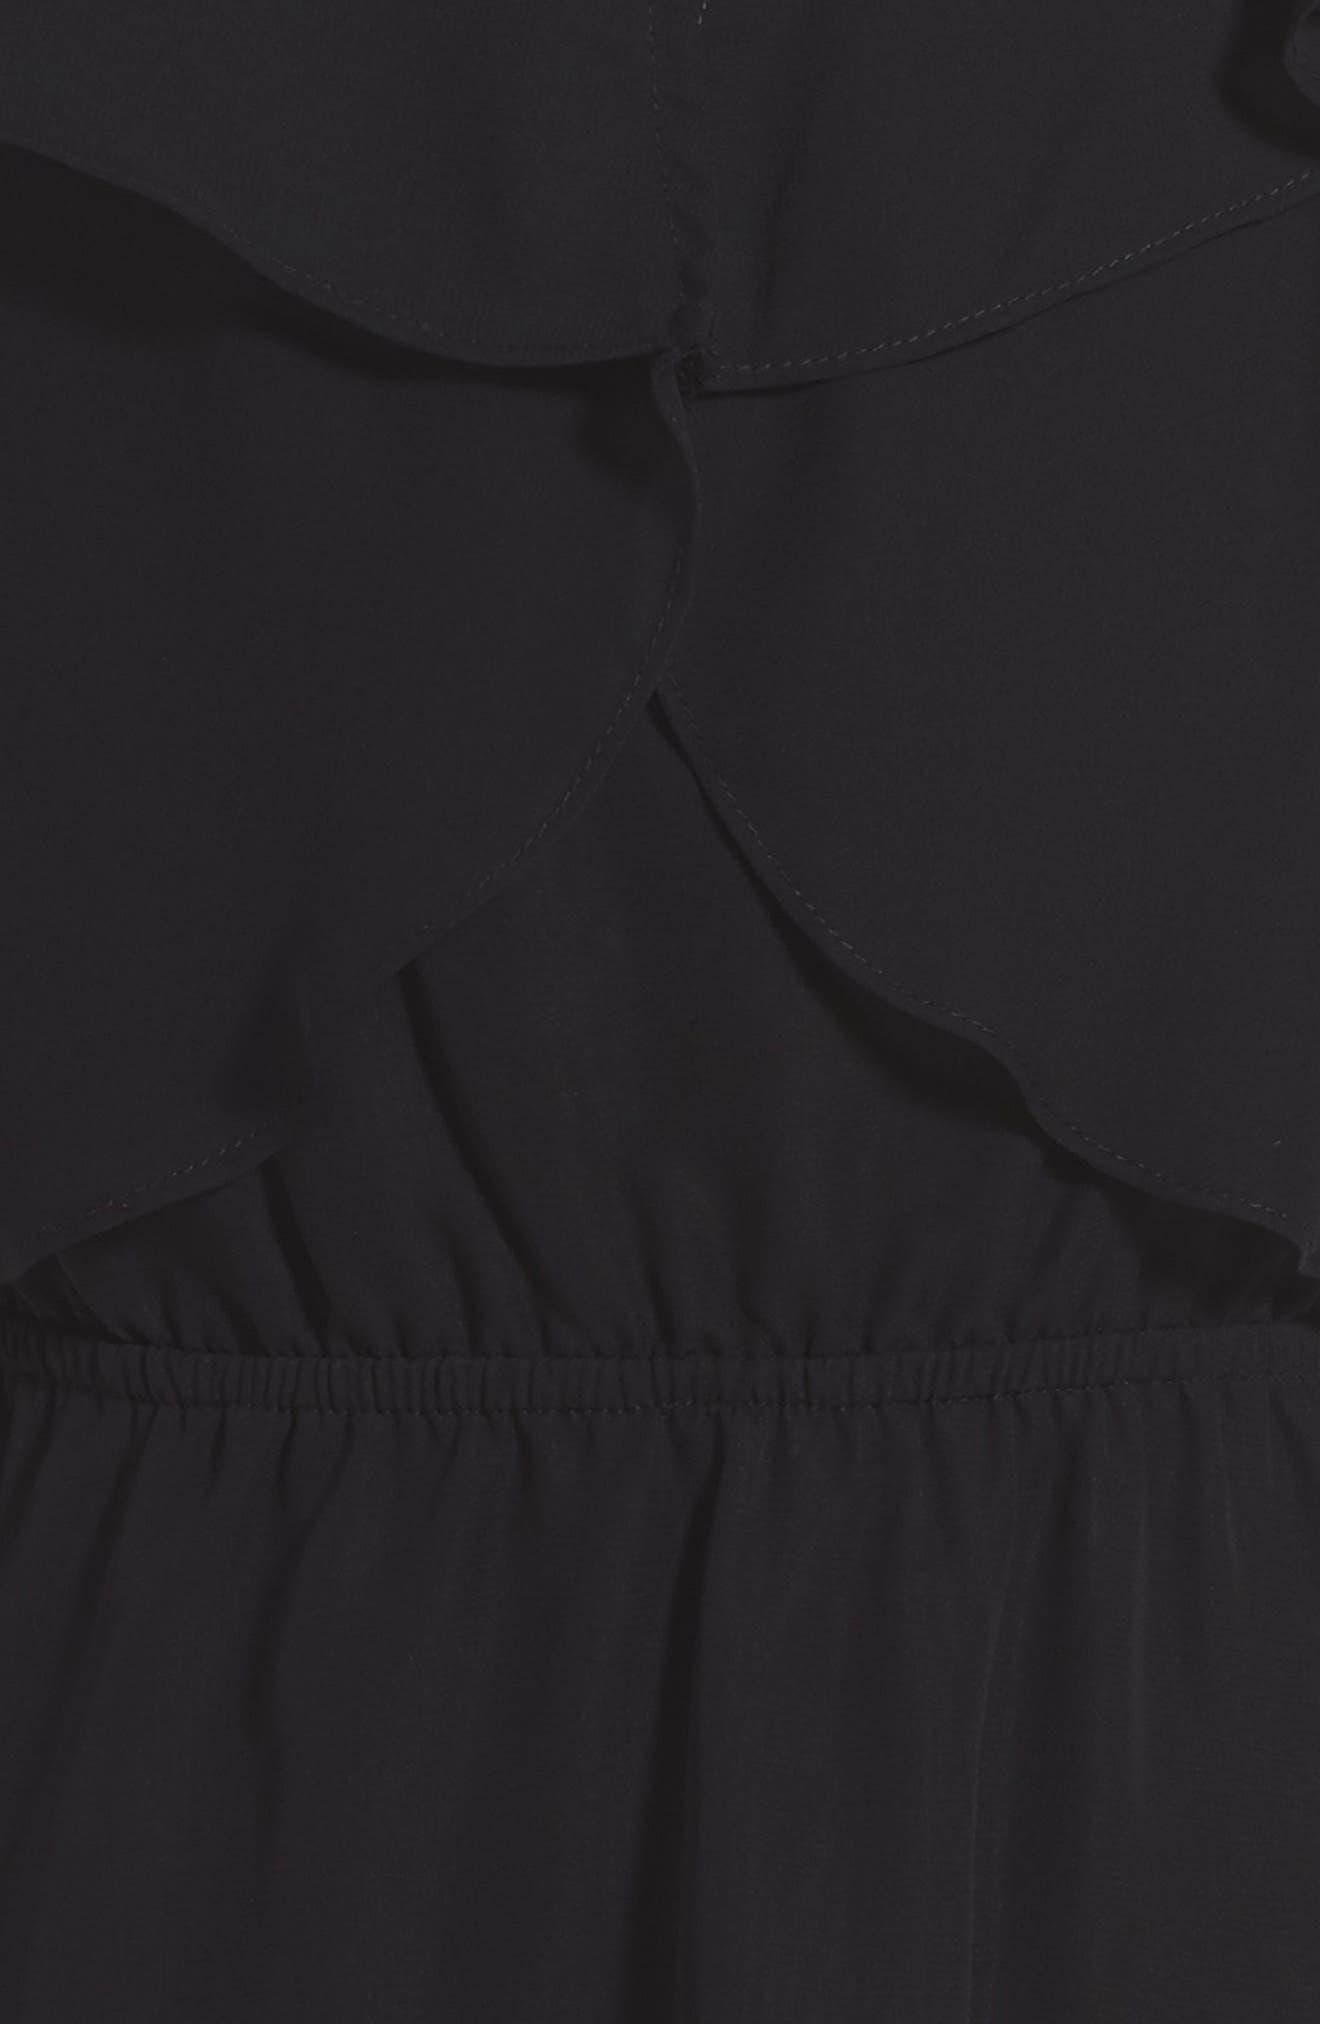 Ruffle Dress,                             Alternate thumbnail 3, color,                             001